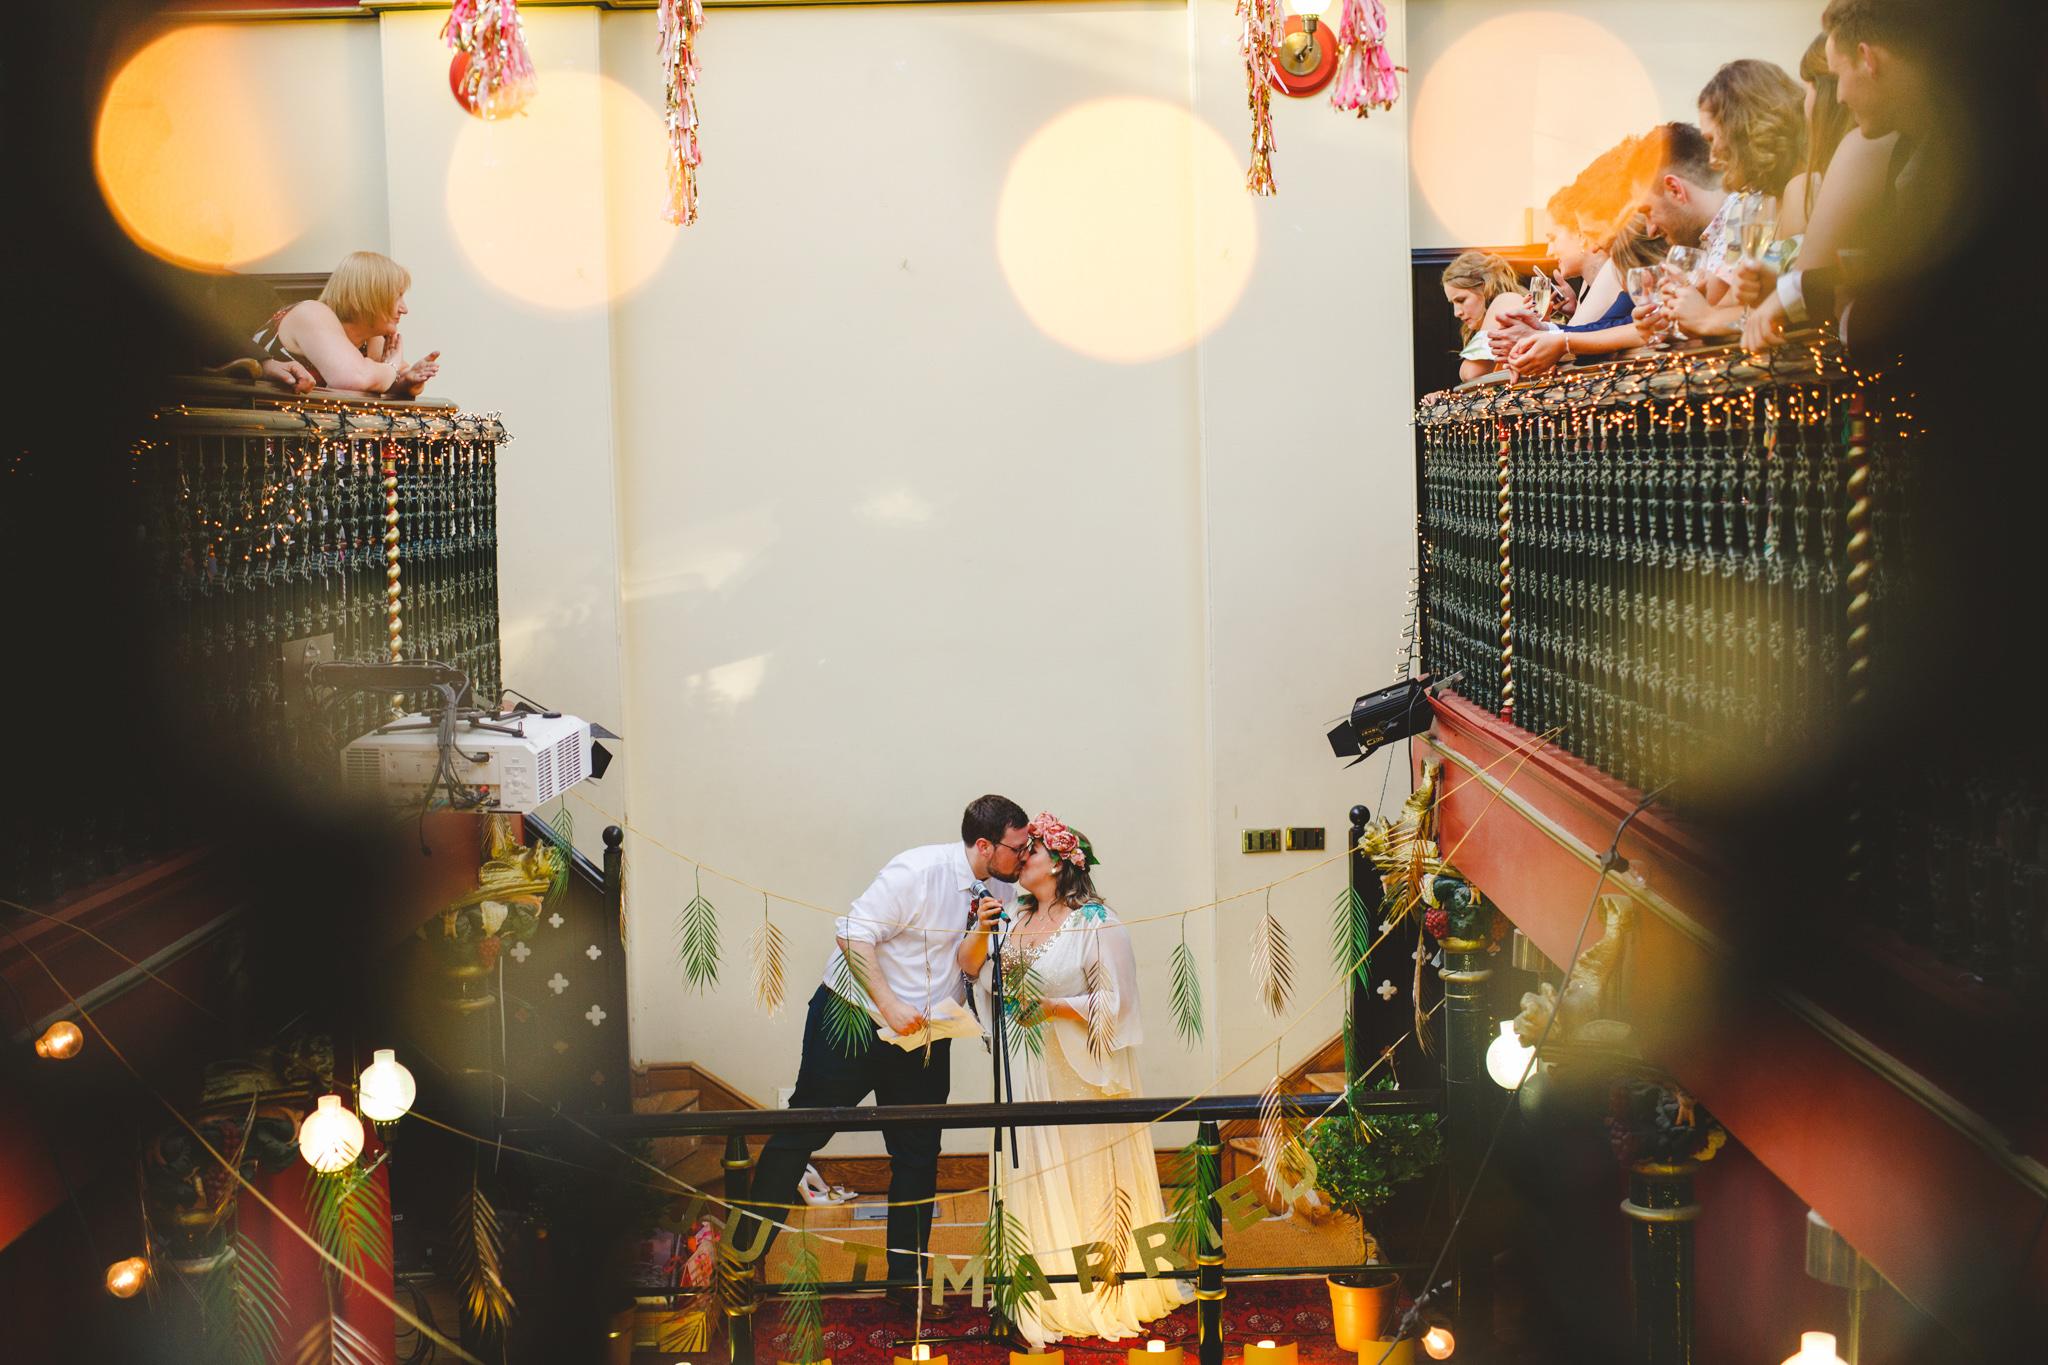 derbyshire-wedding-photographer-videographer-camera-hannah-27.jpg